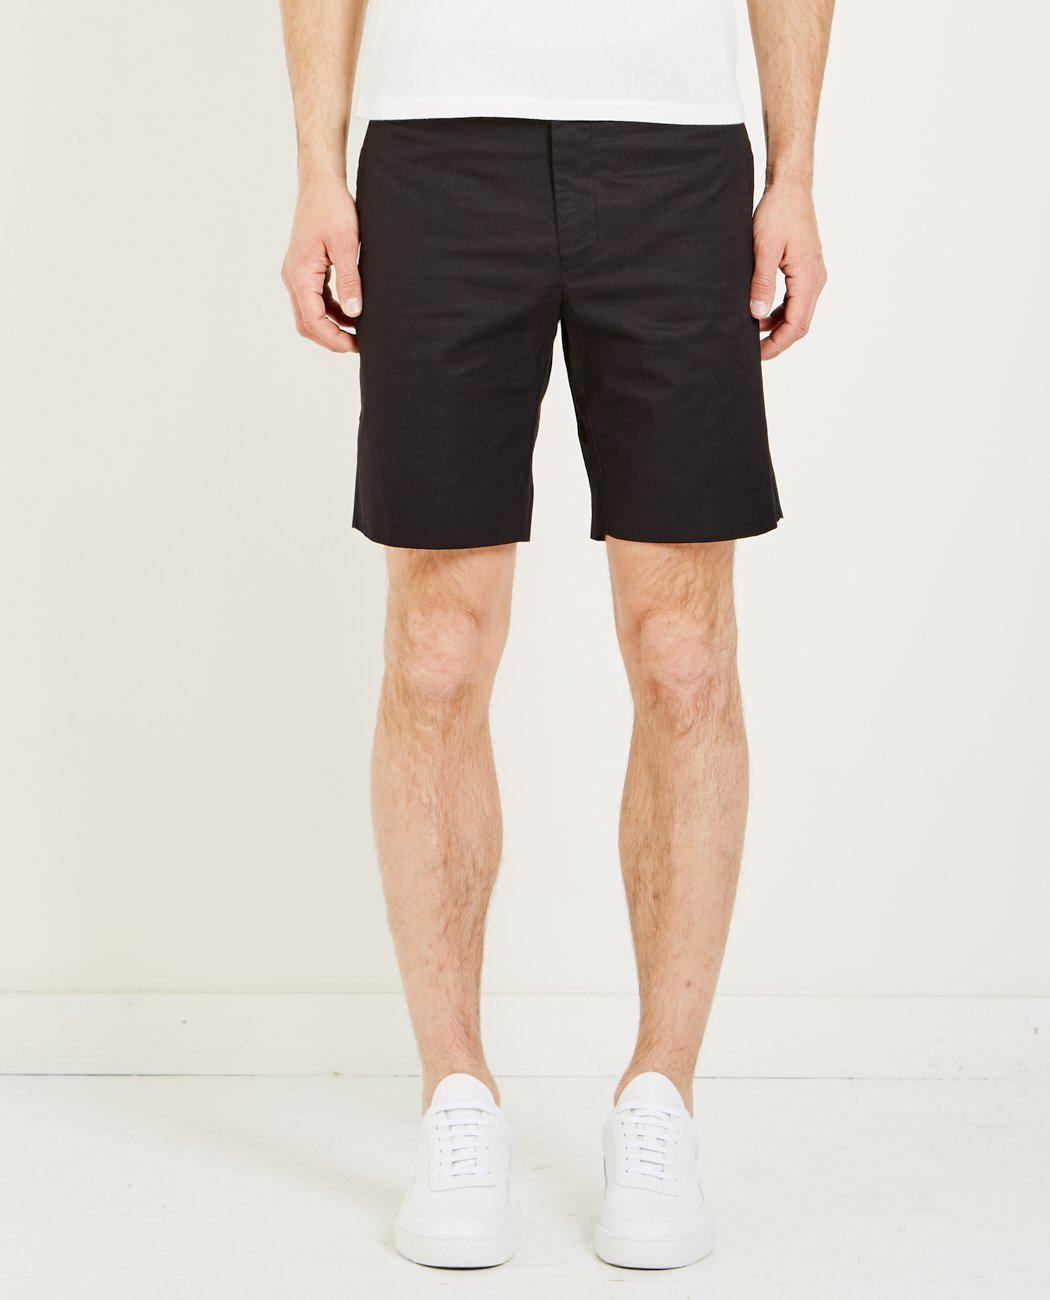 Paolo bermuda shorts - Black Wood Wood zpLMQQQZs